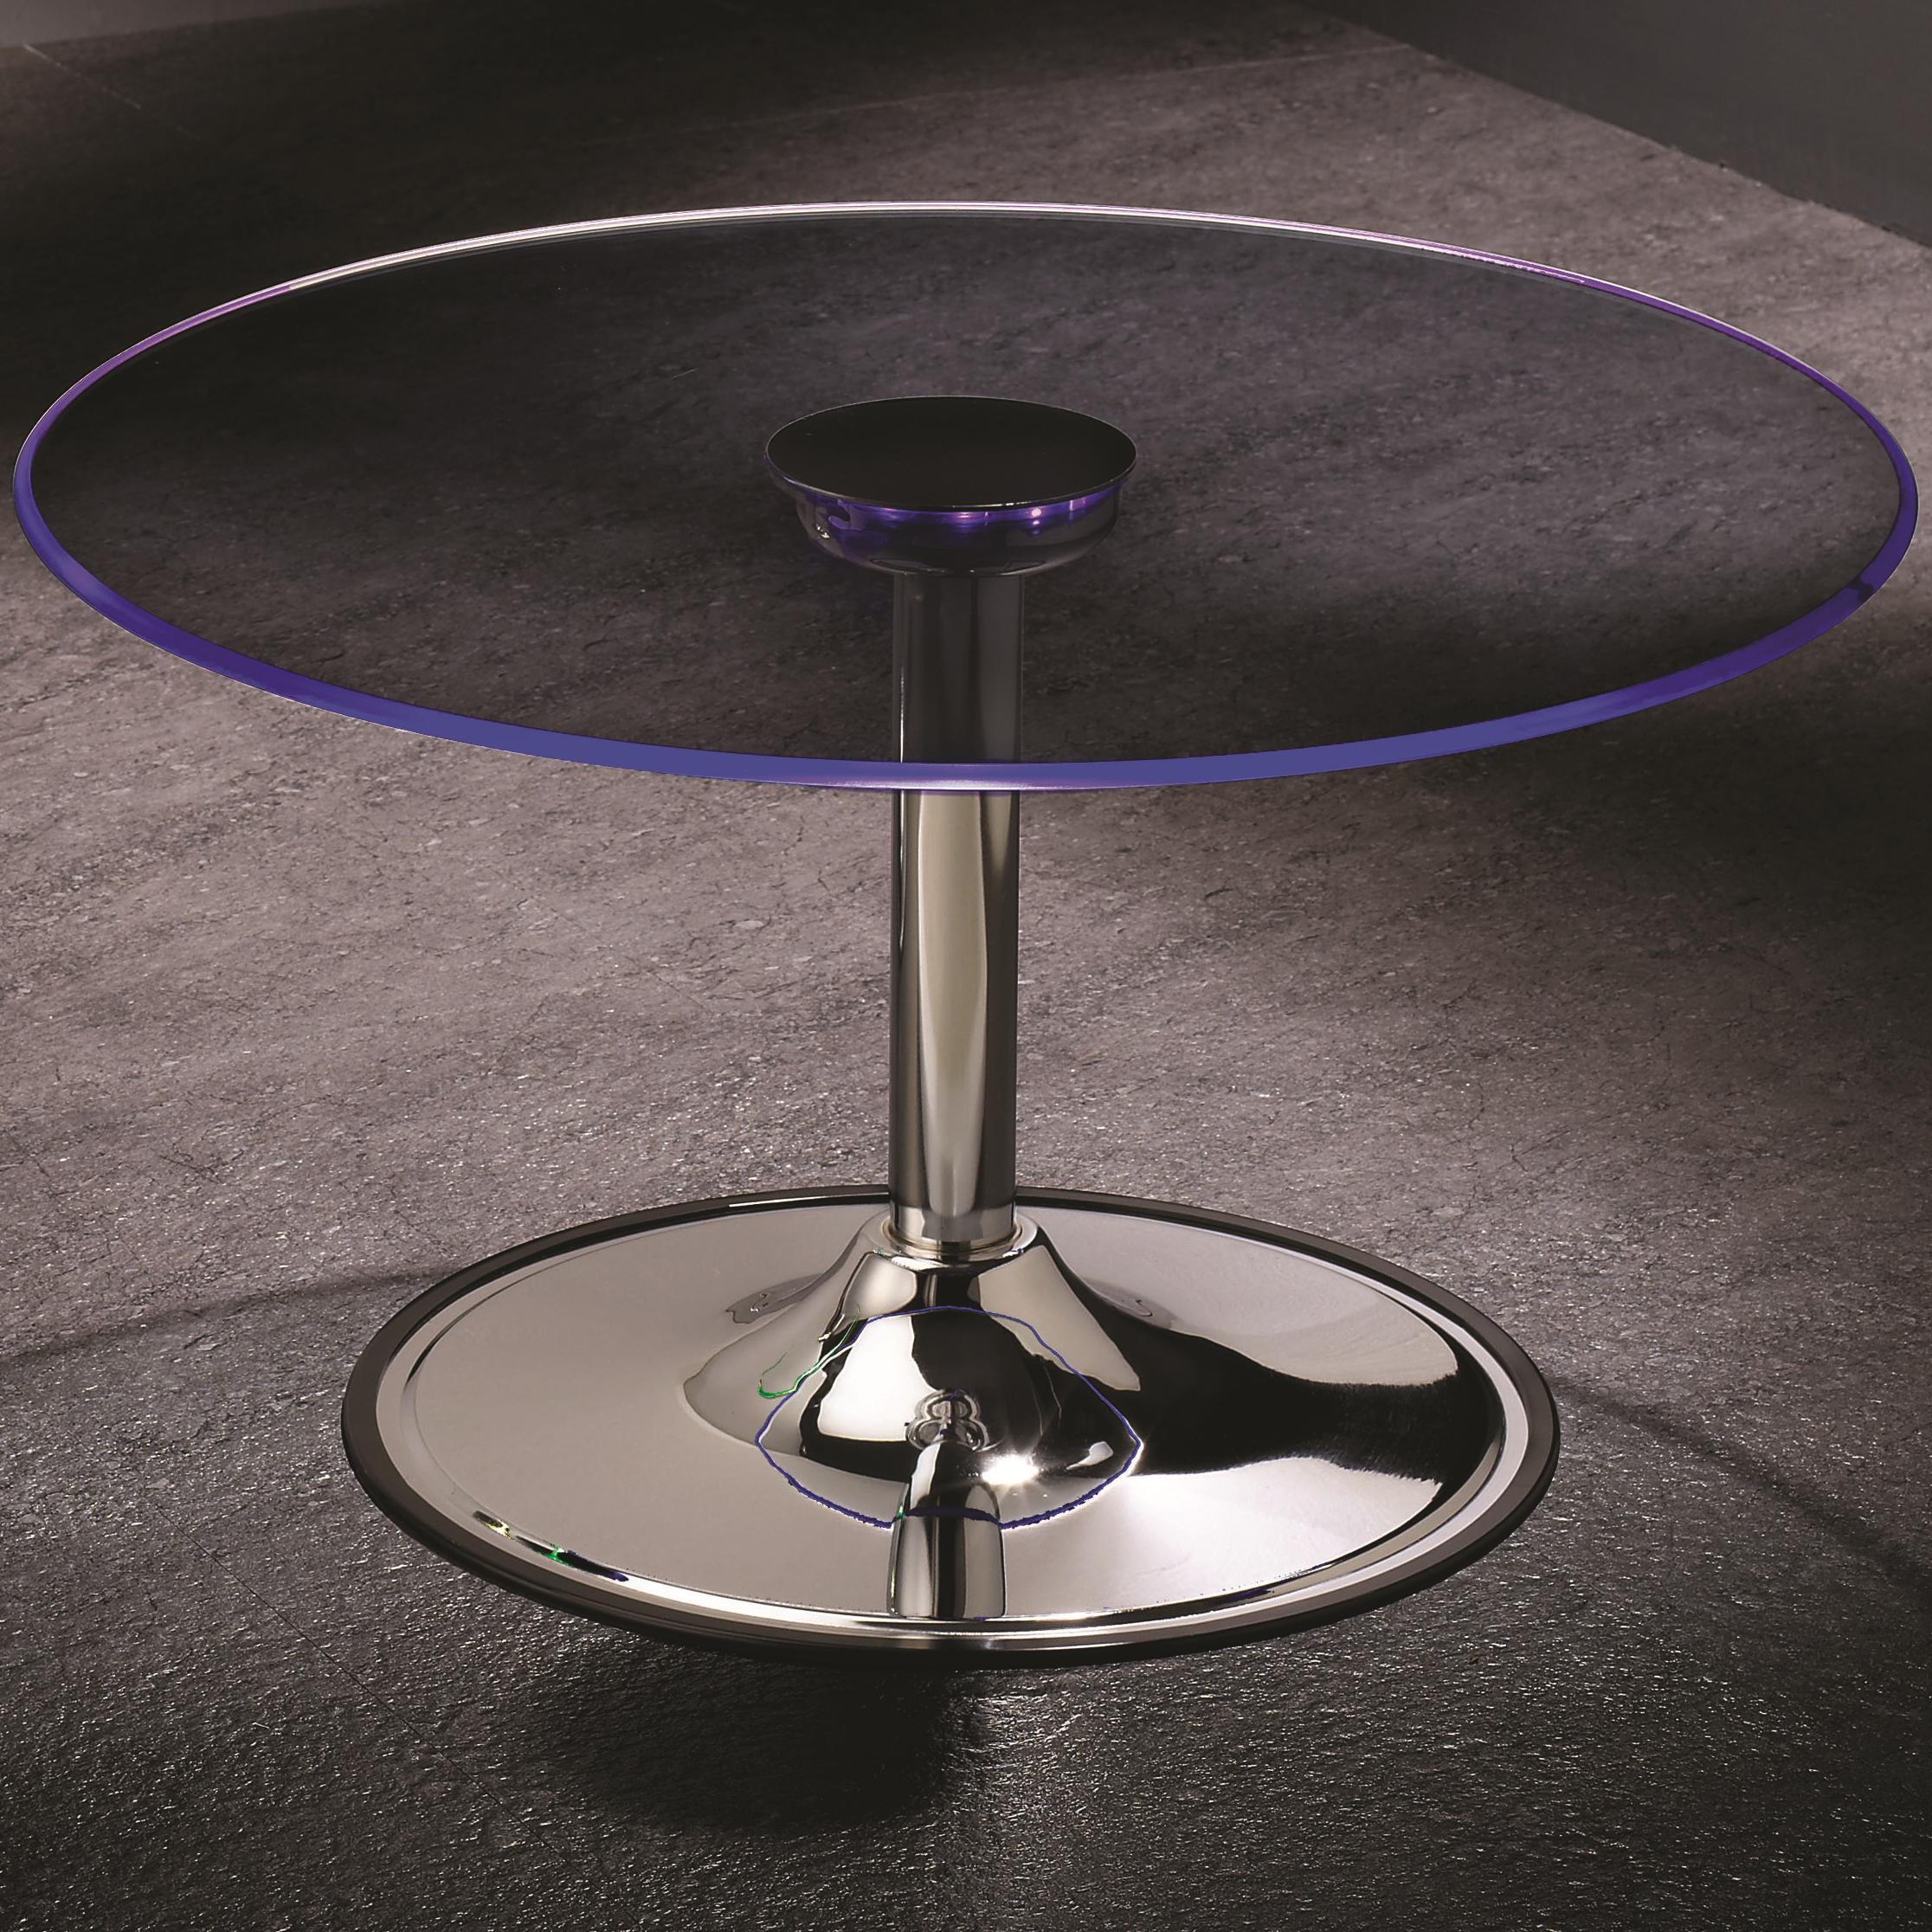 Merveilleux Coaster LEDCoffee Table; Coaster LEDCoffee Table